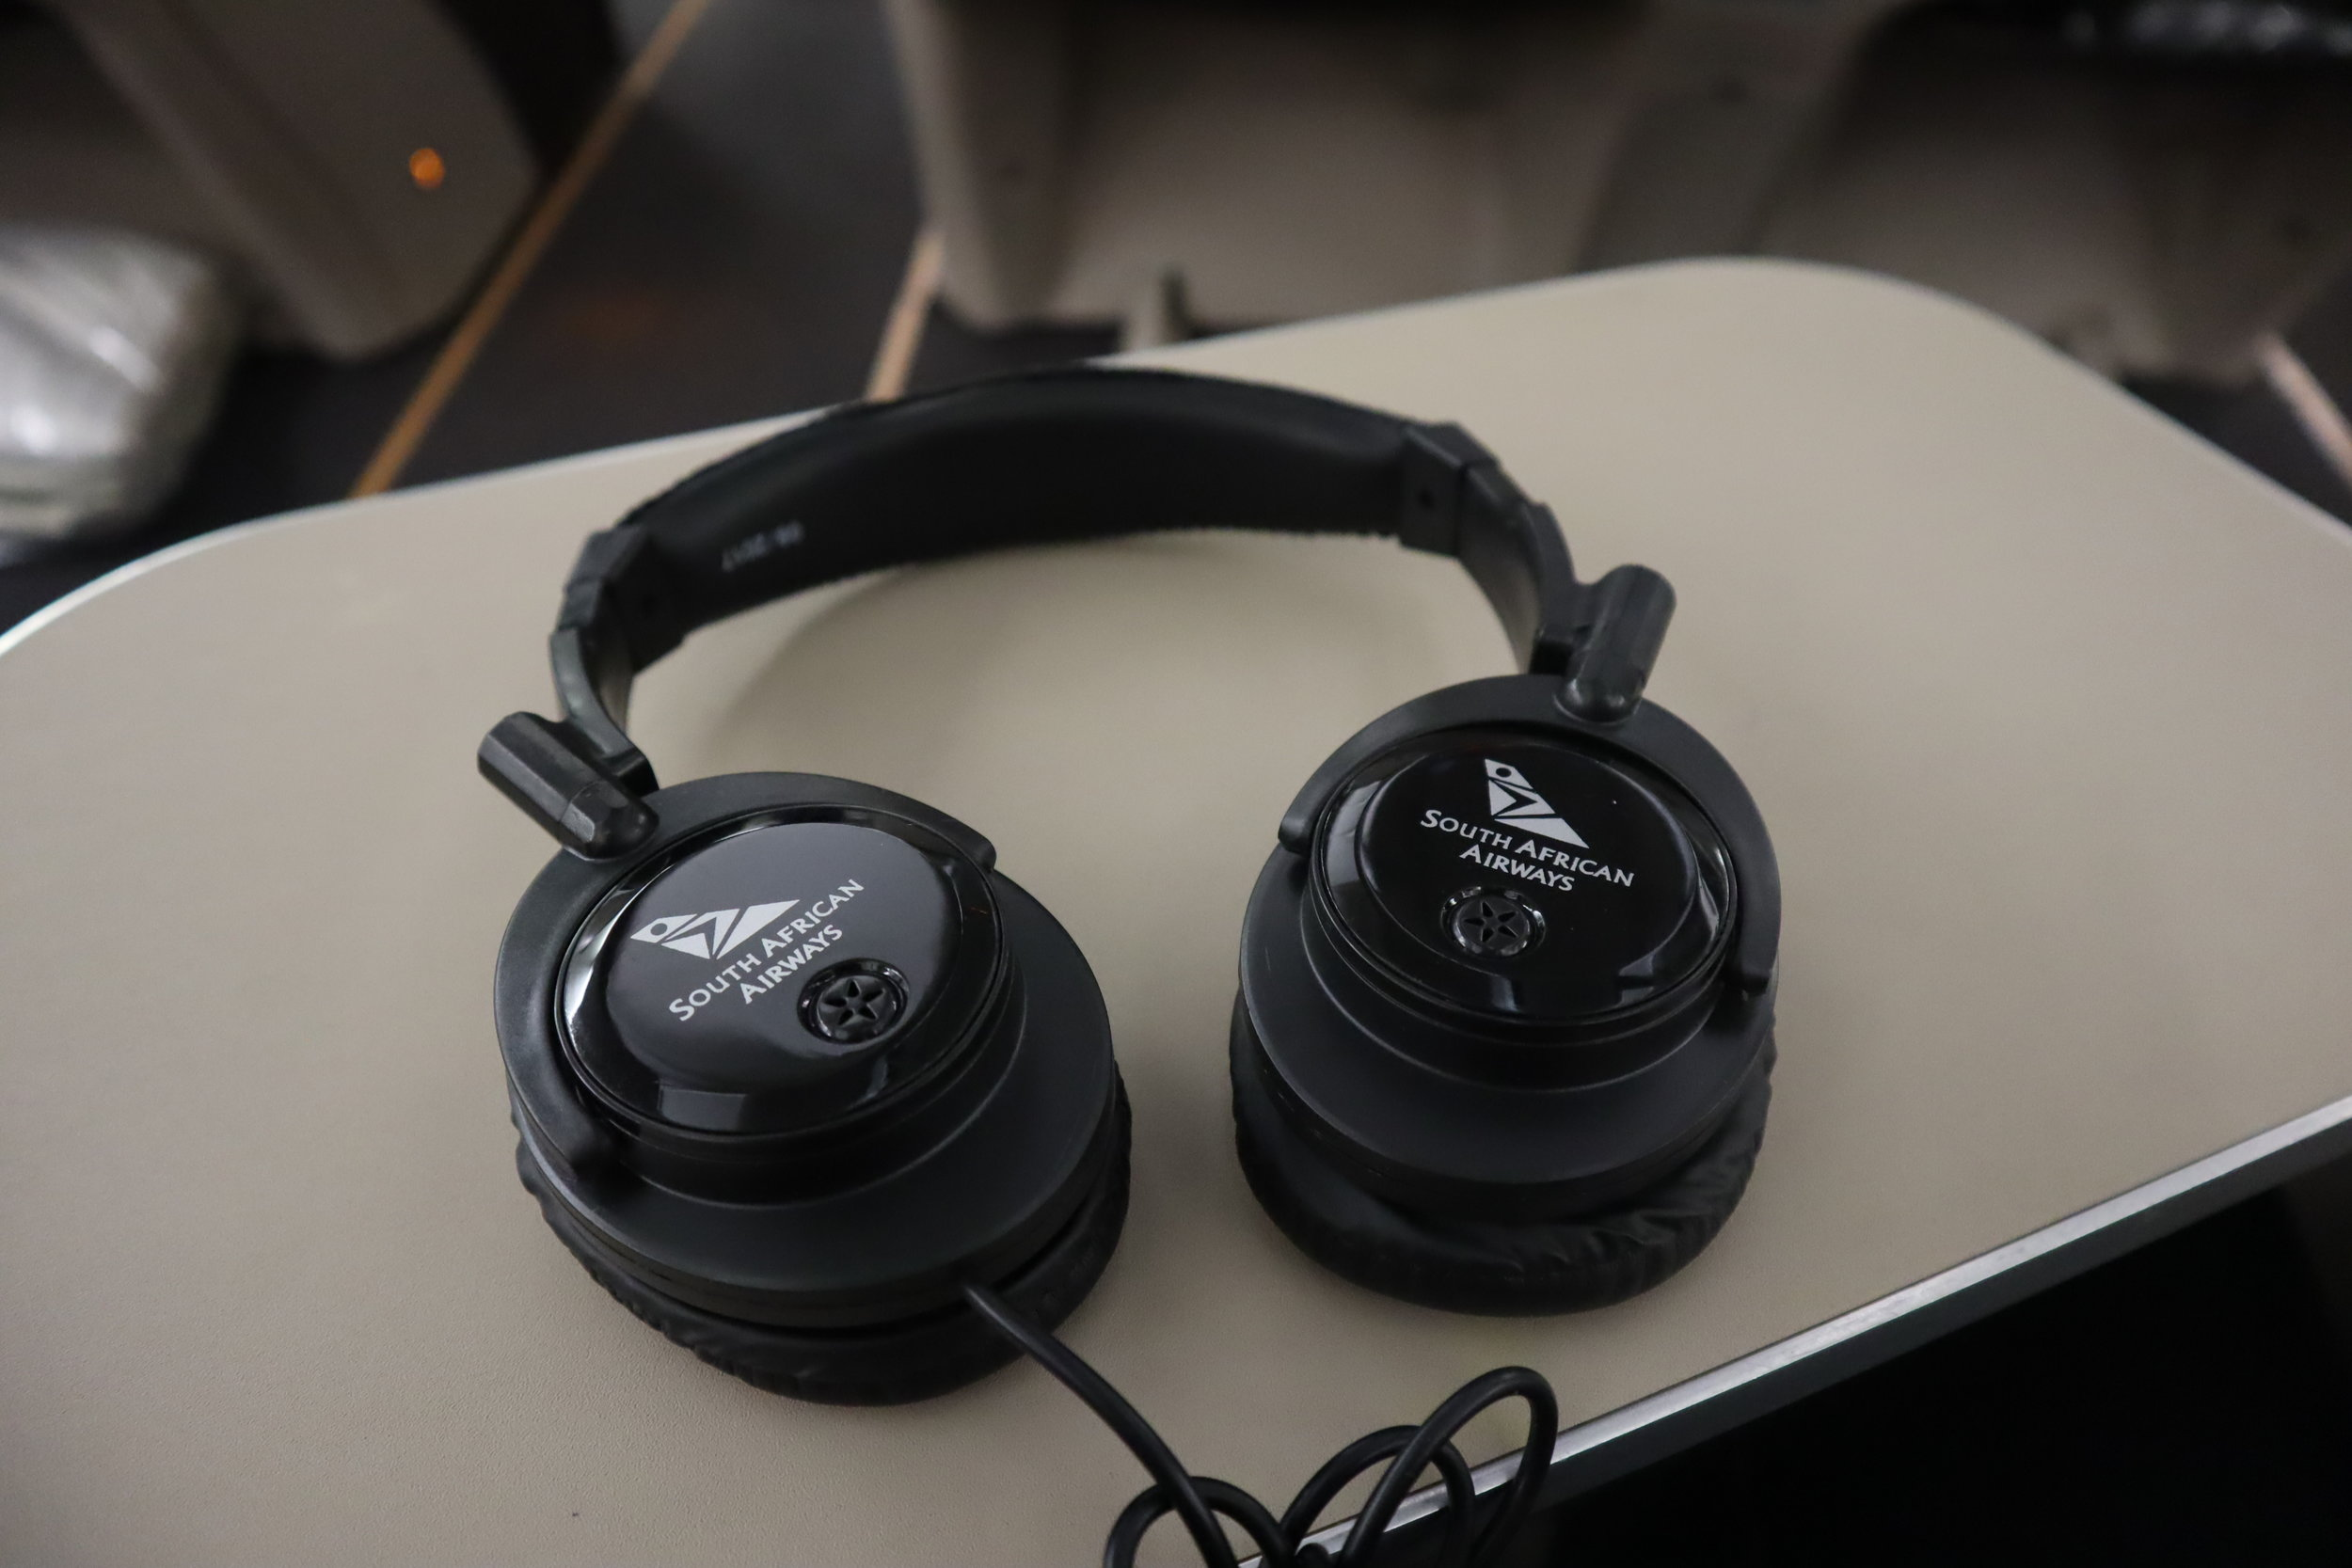 South African Airways business class – Headphones